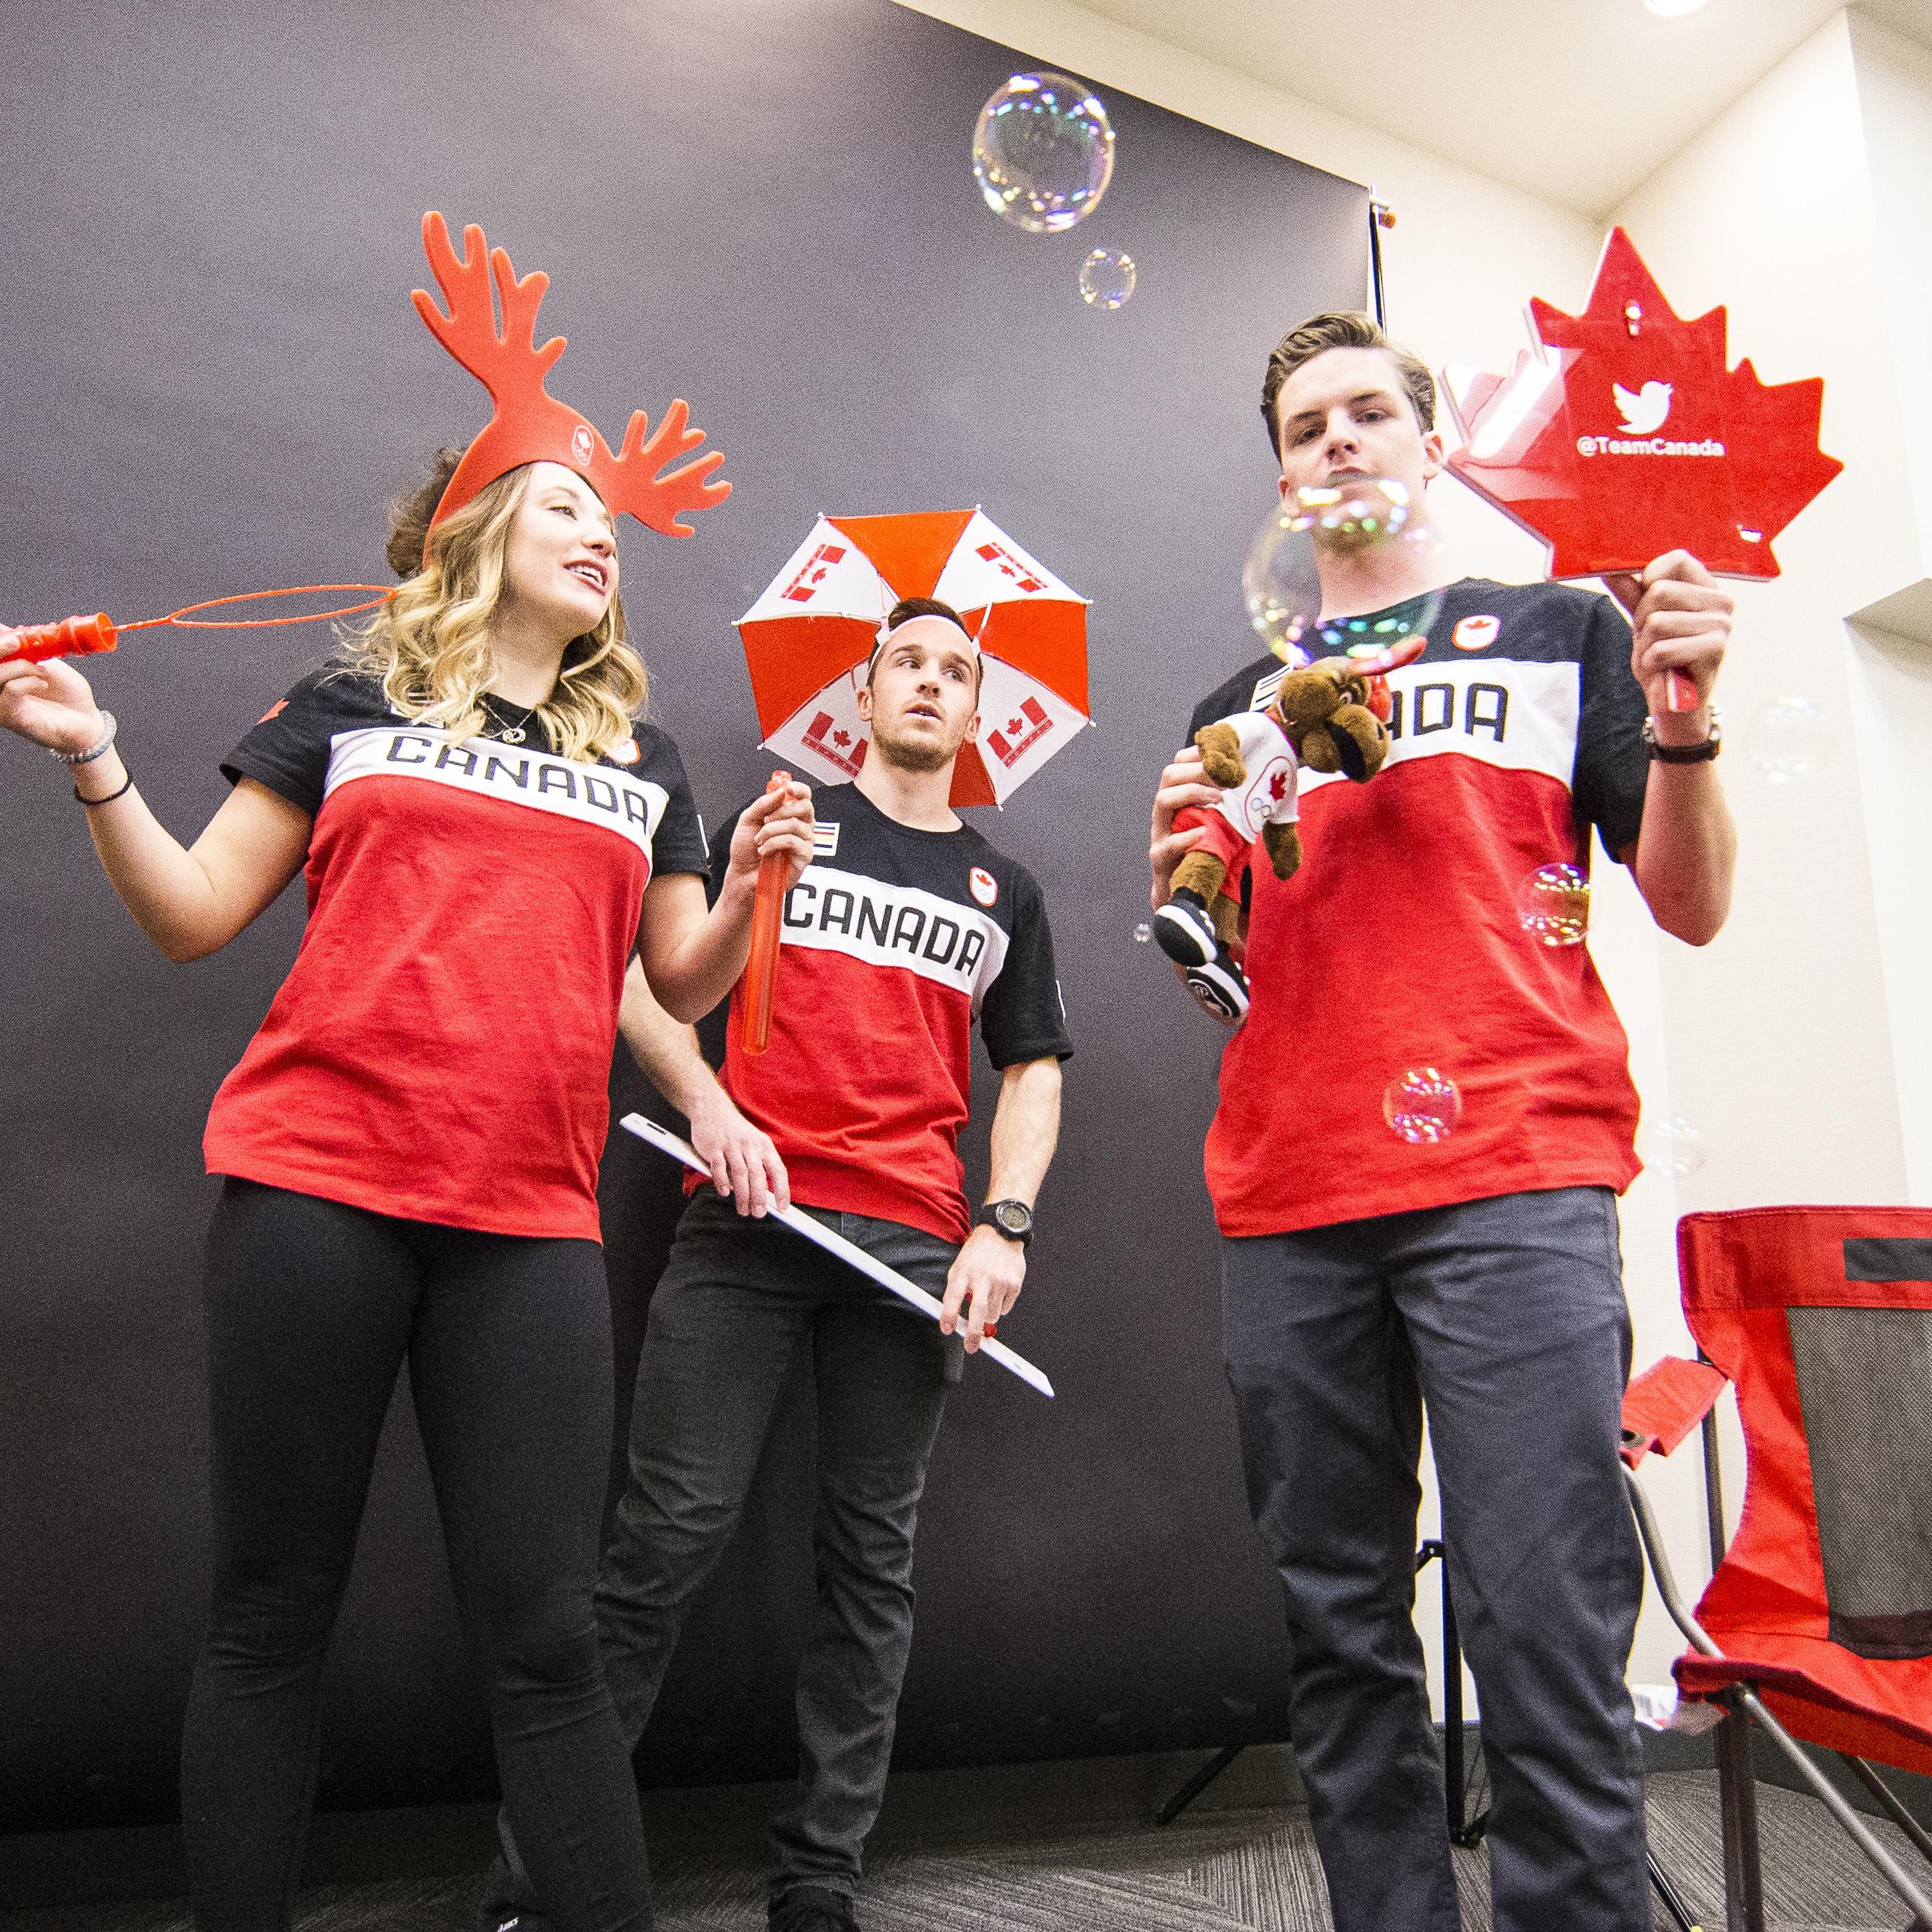 Three Olympians on a photoshoot